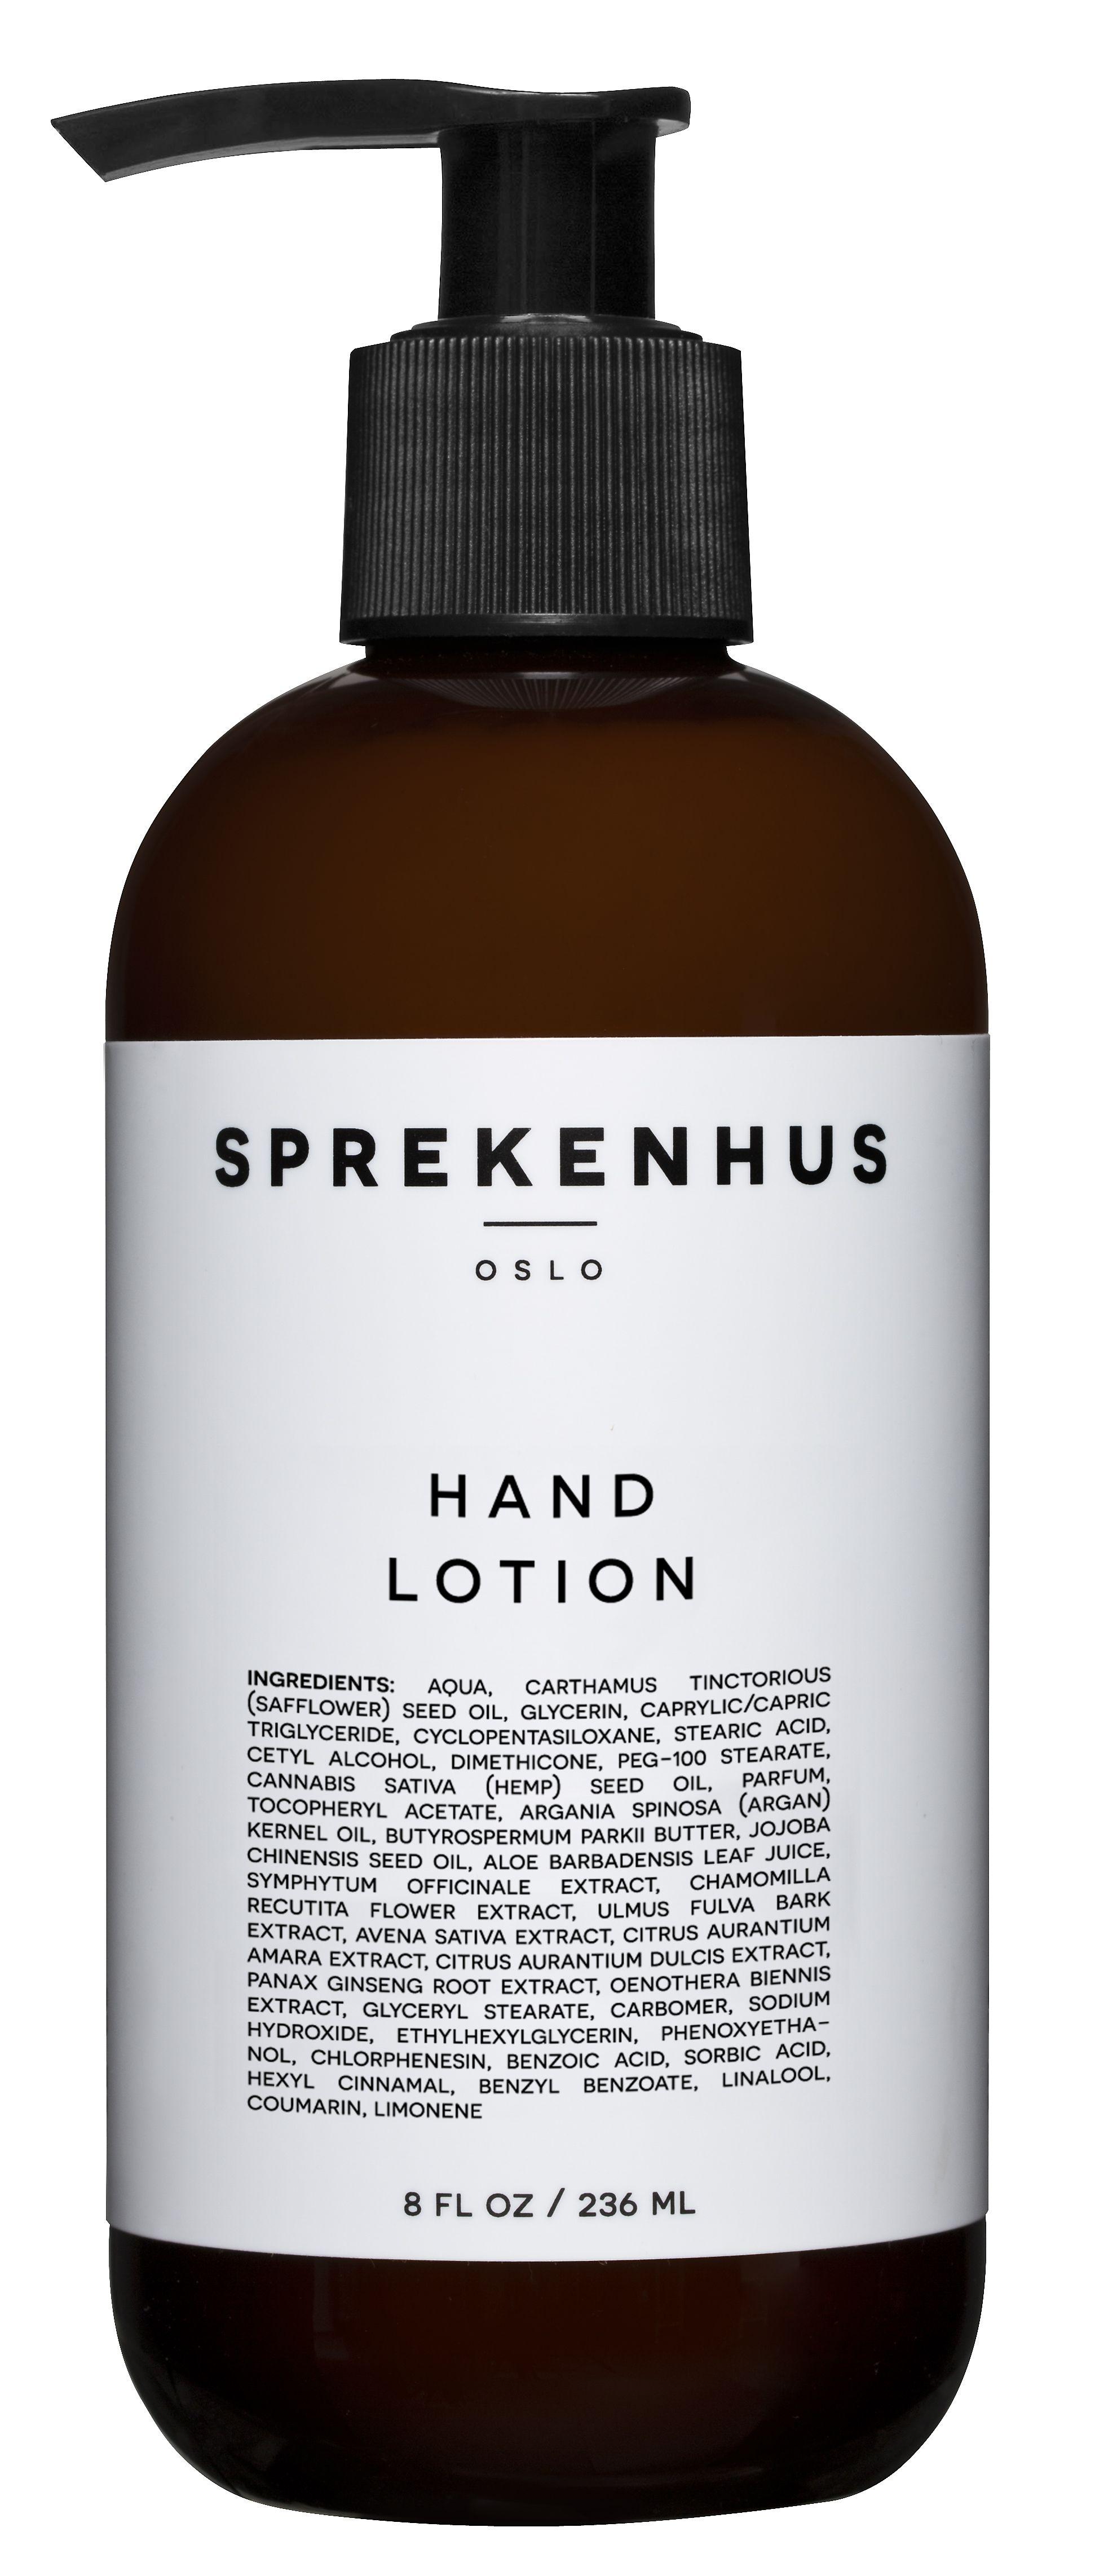 ALEXANDER SPREKENHUS Hand Lotion | Coverbrands